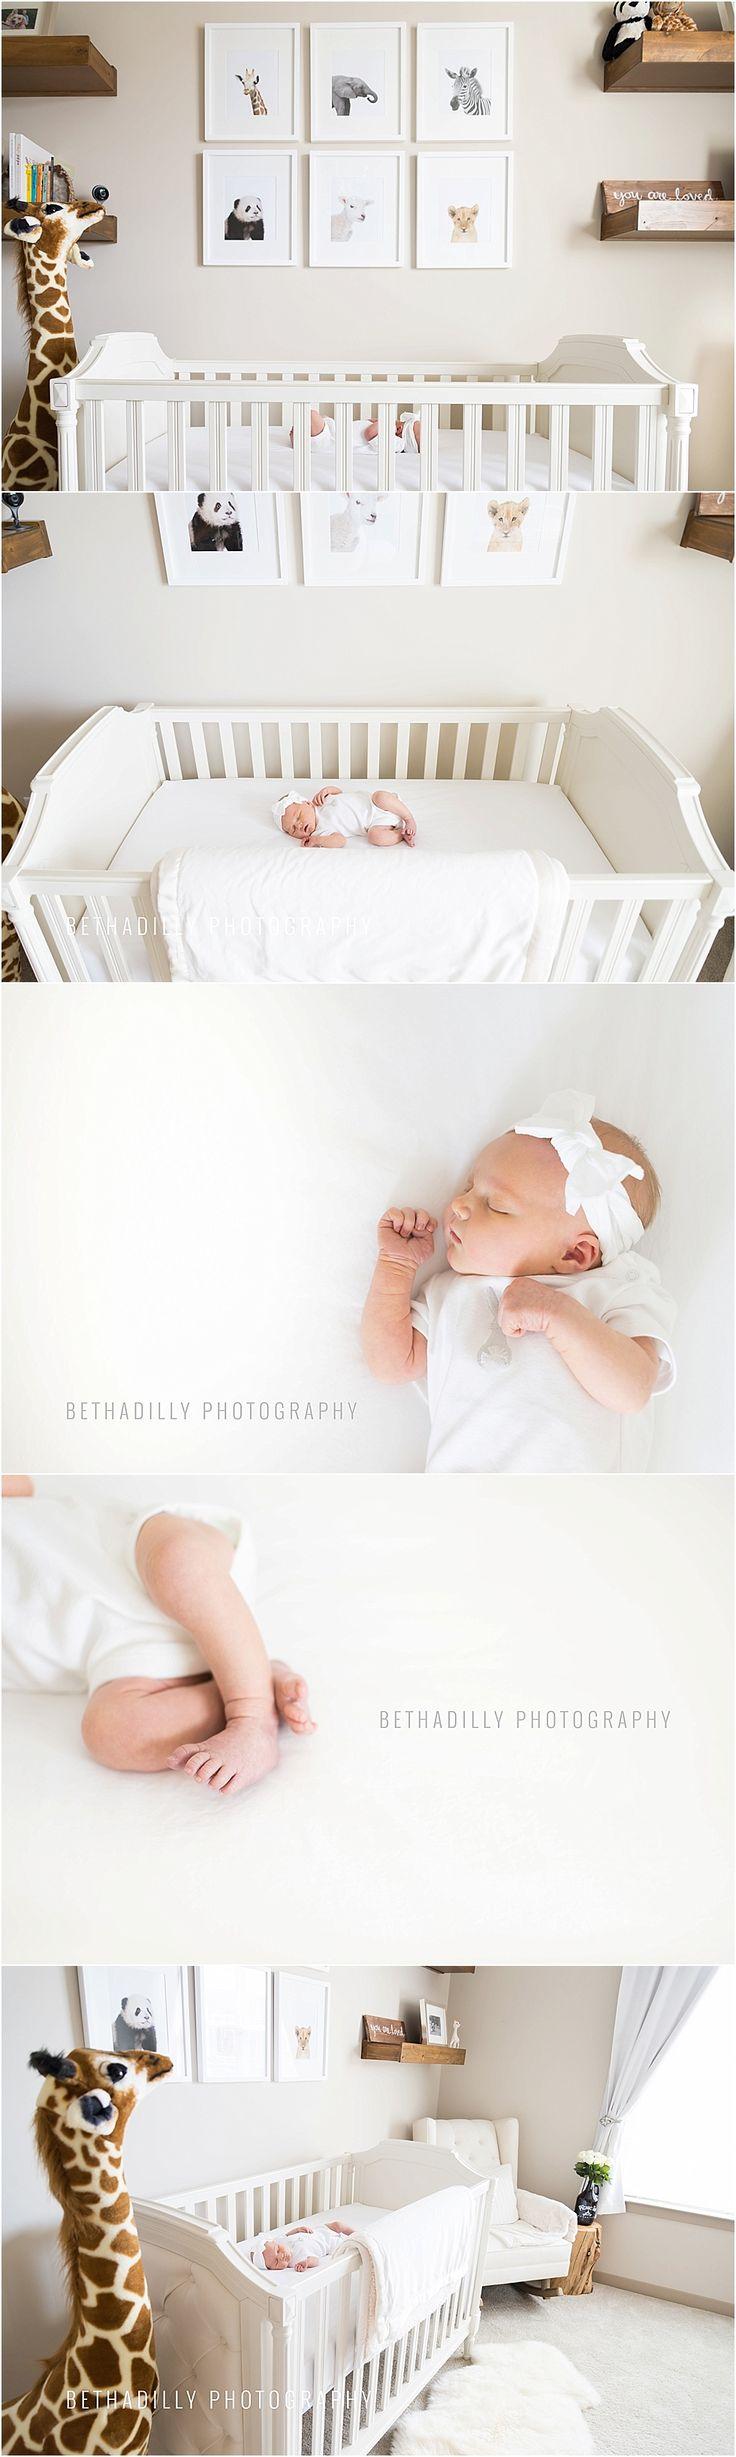 5 Blissful Days | Northern Virginia Lifestyle Newborn Photographer |  bethadilly photography